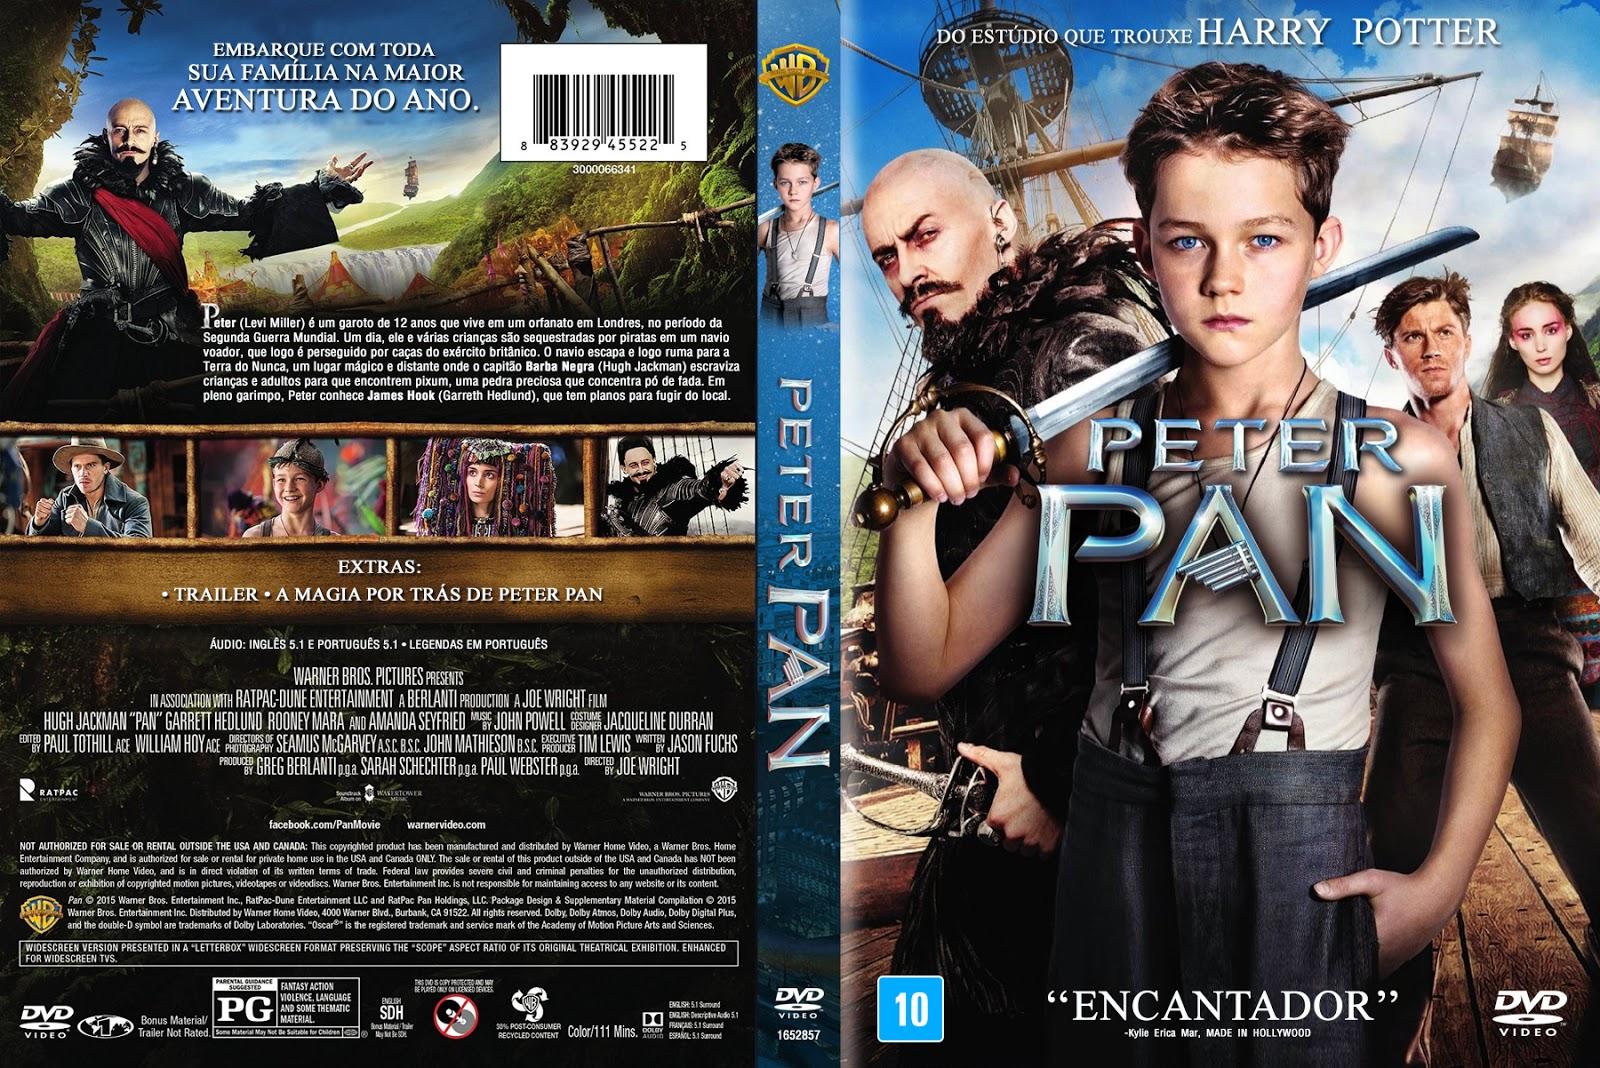 Peter Pan DVD-R peter 2Bpan